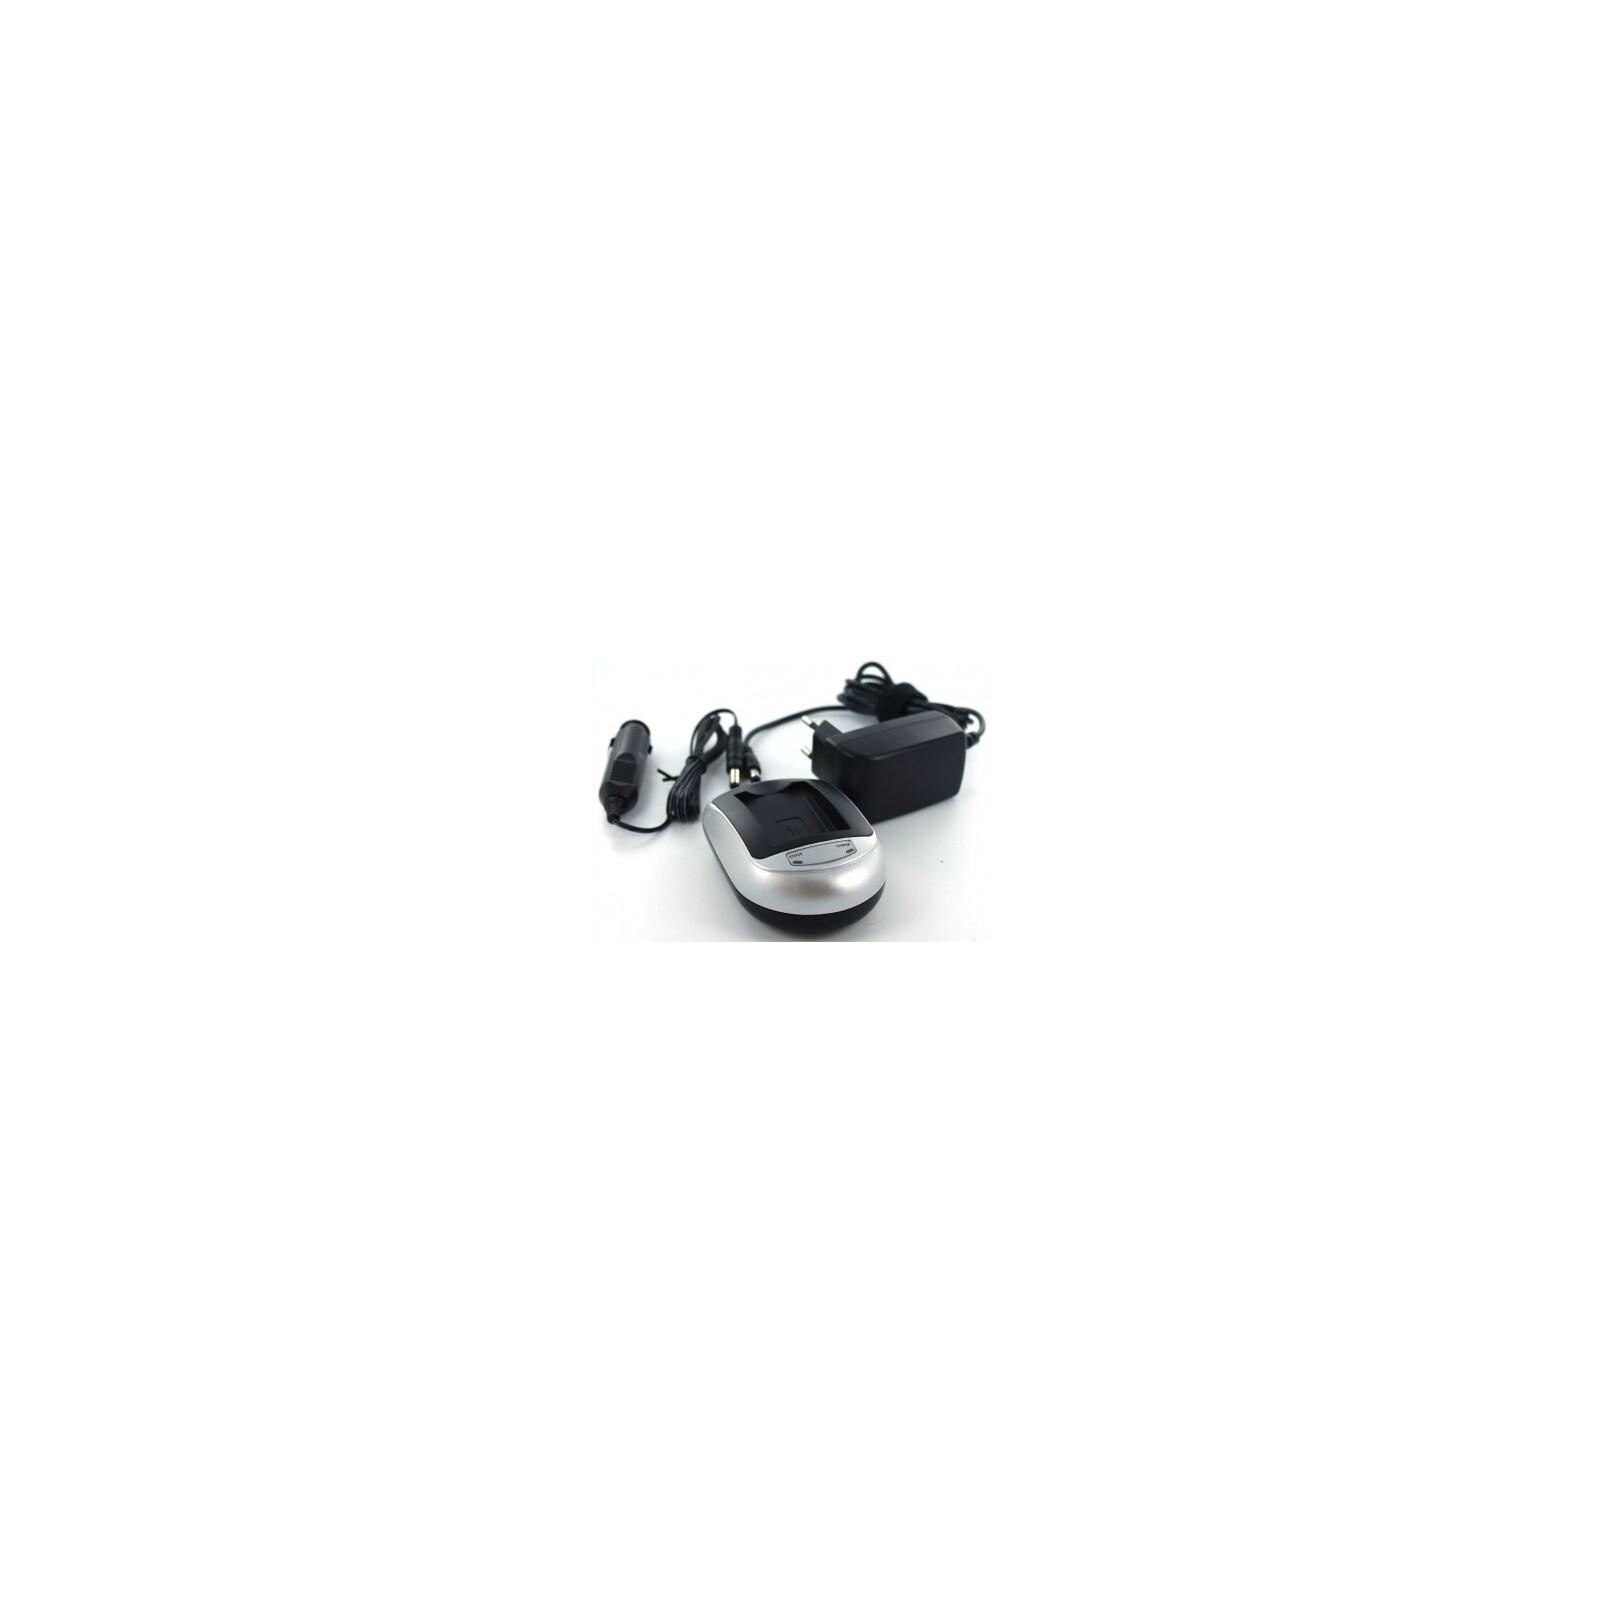 AGI 85095 Ladegerät Nikon Coolpix P500